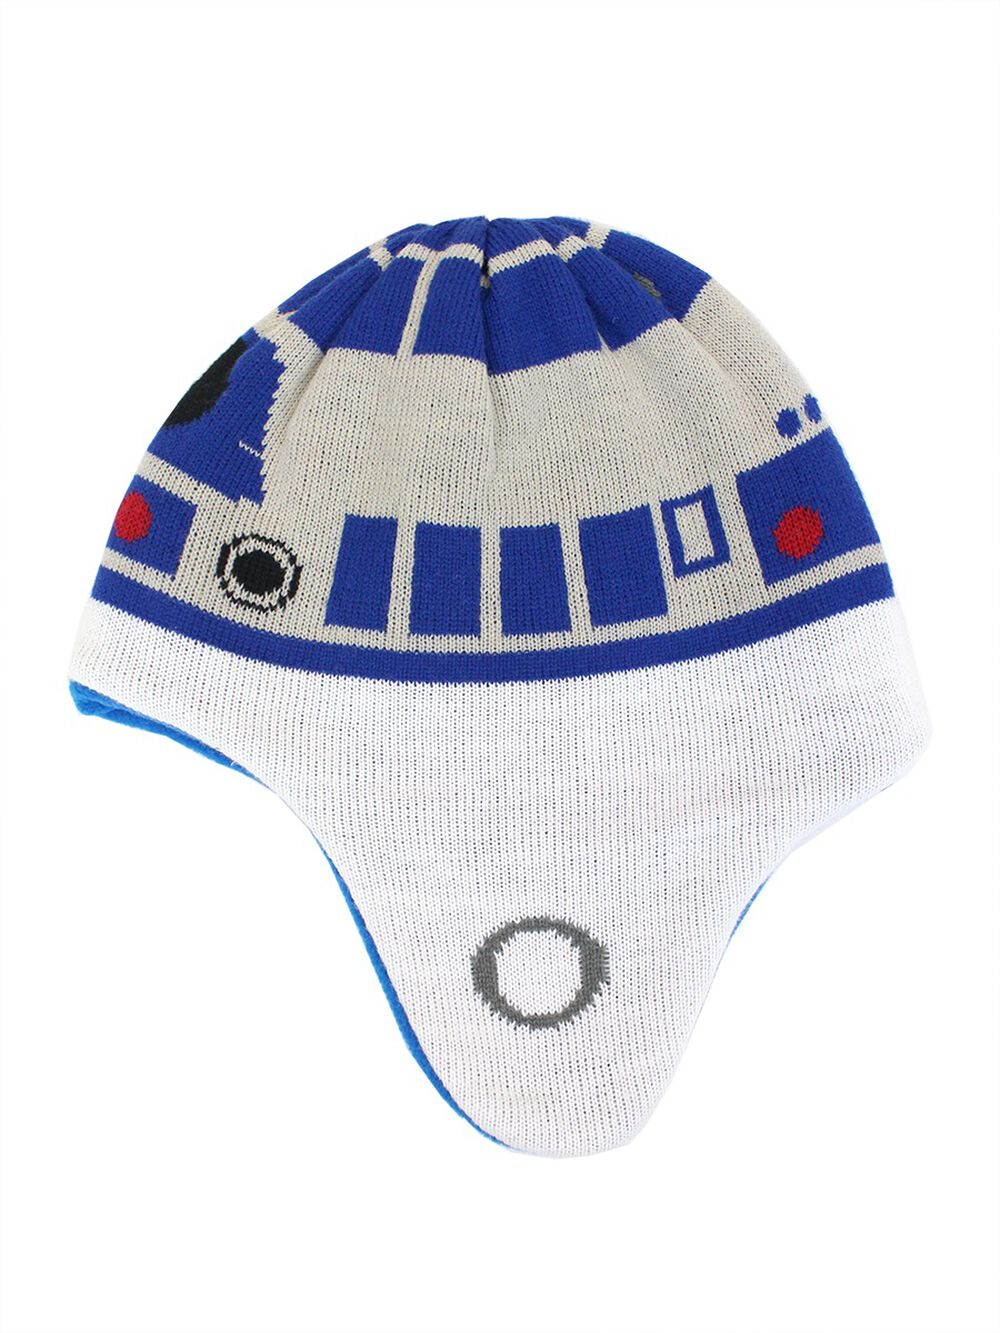 Bonnet - Star Wars - R2-D2